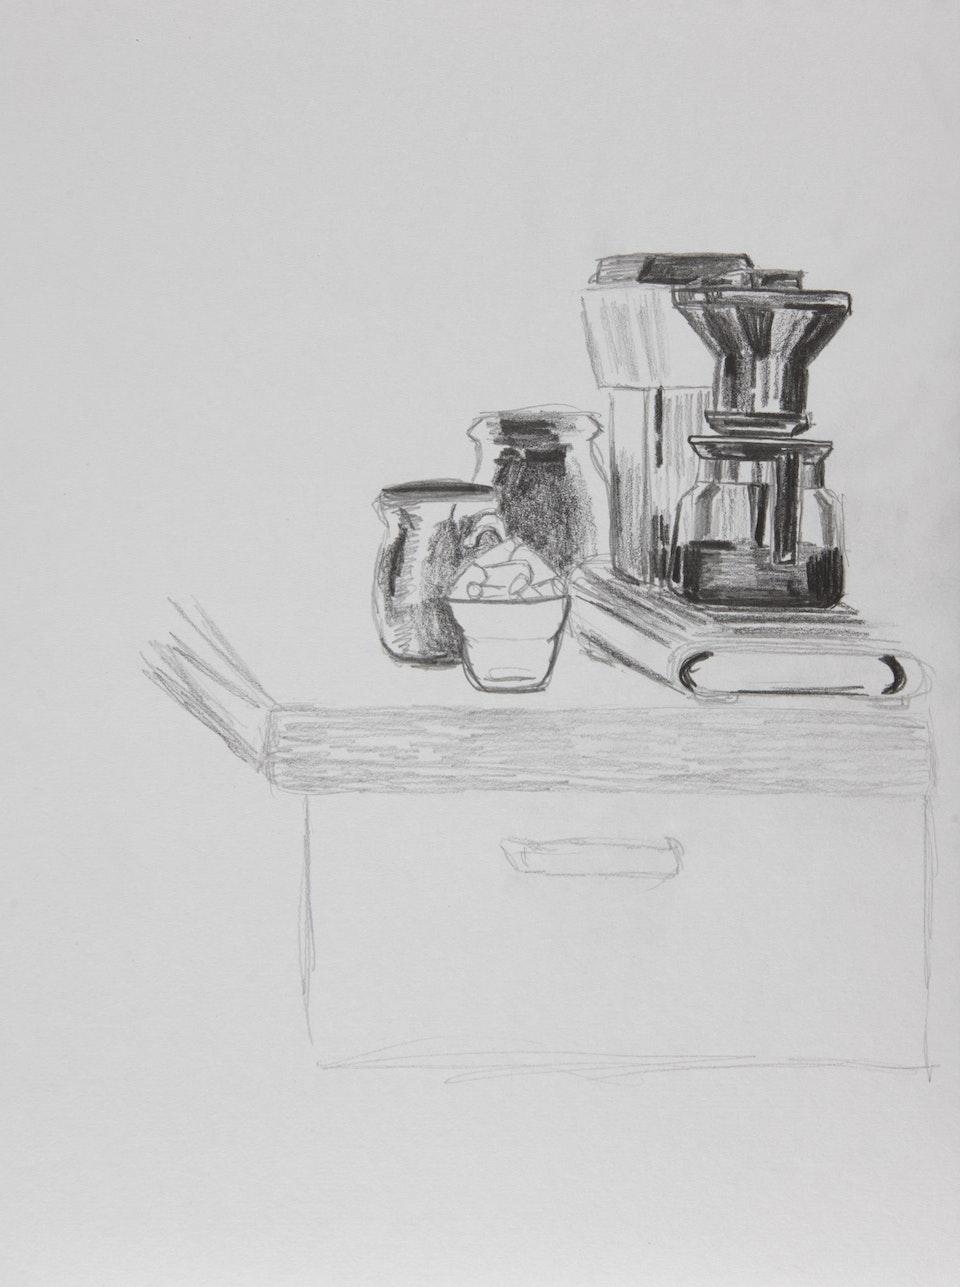 Domestic - Coffee - 2020 - Pencil on Paper - 21 x 29 cm A4